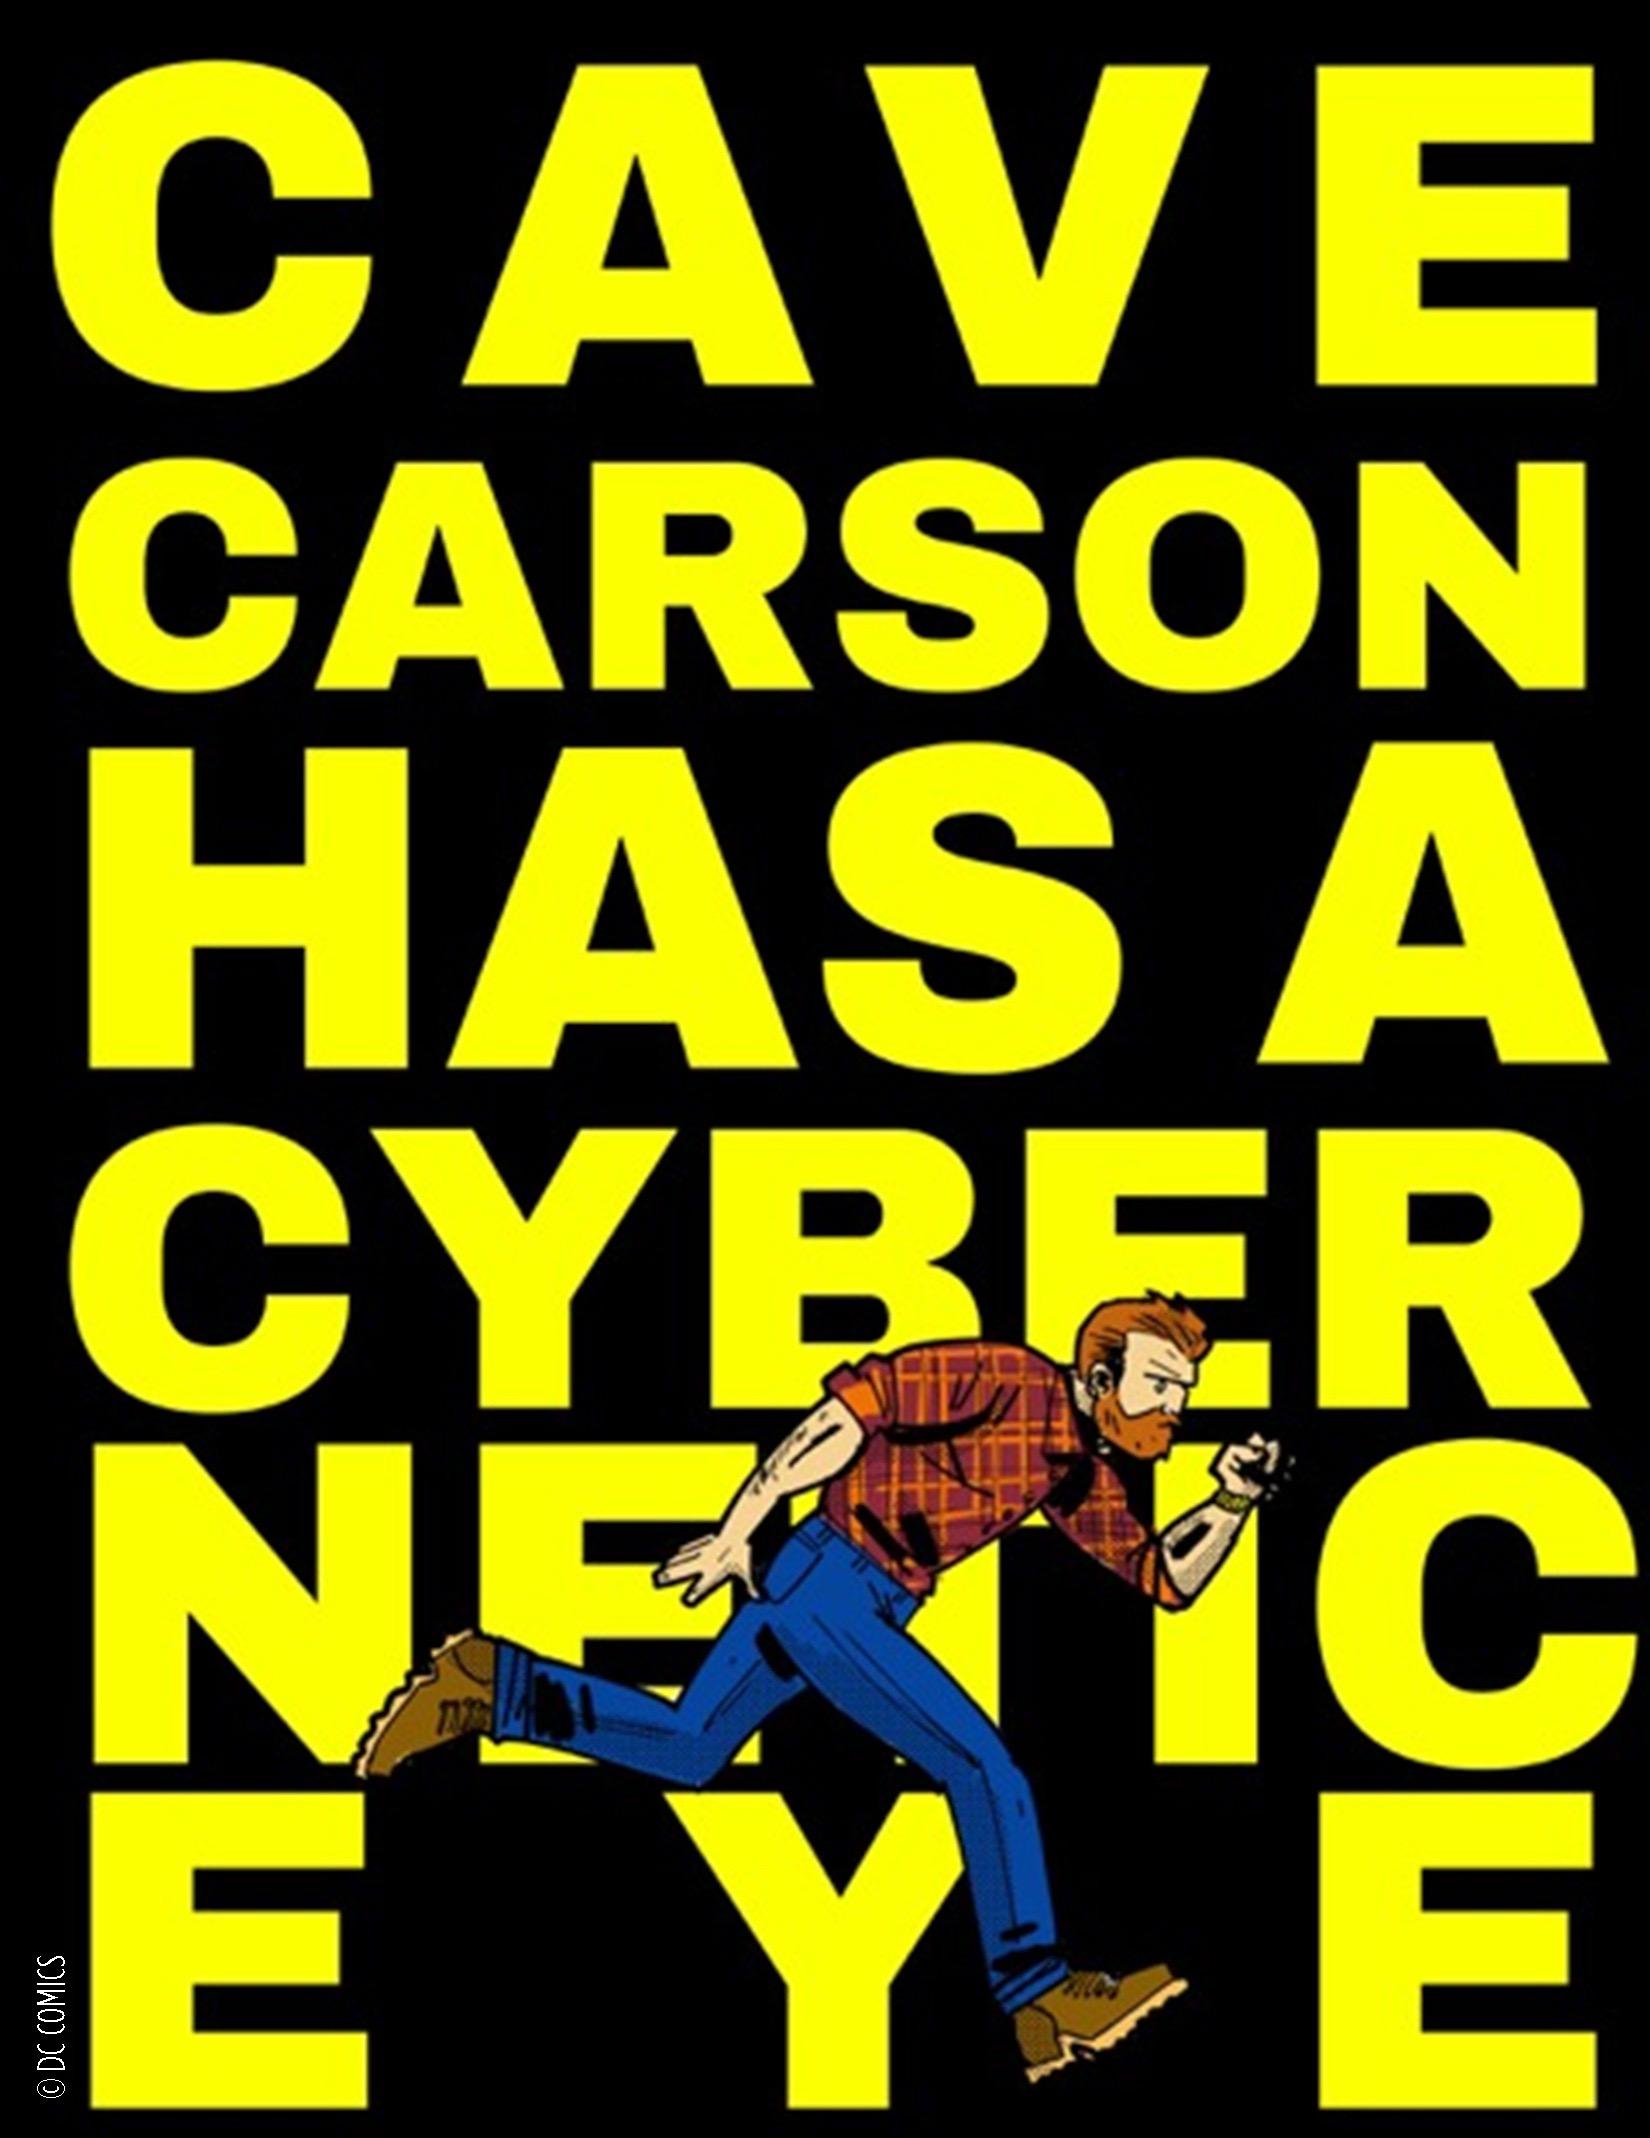 Cave-Carson 11x17.jpeg